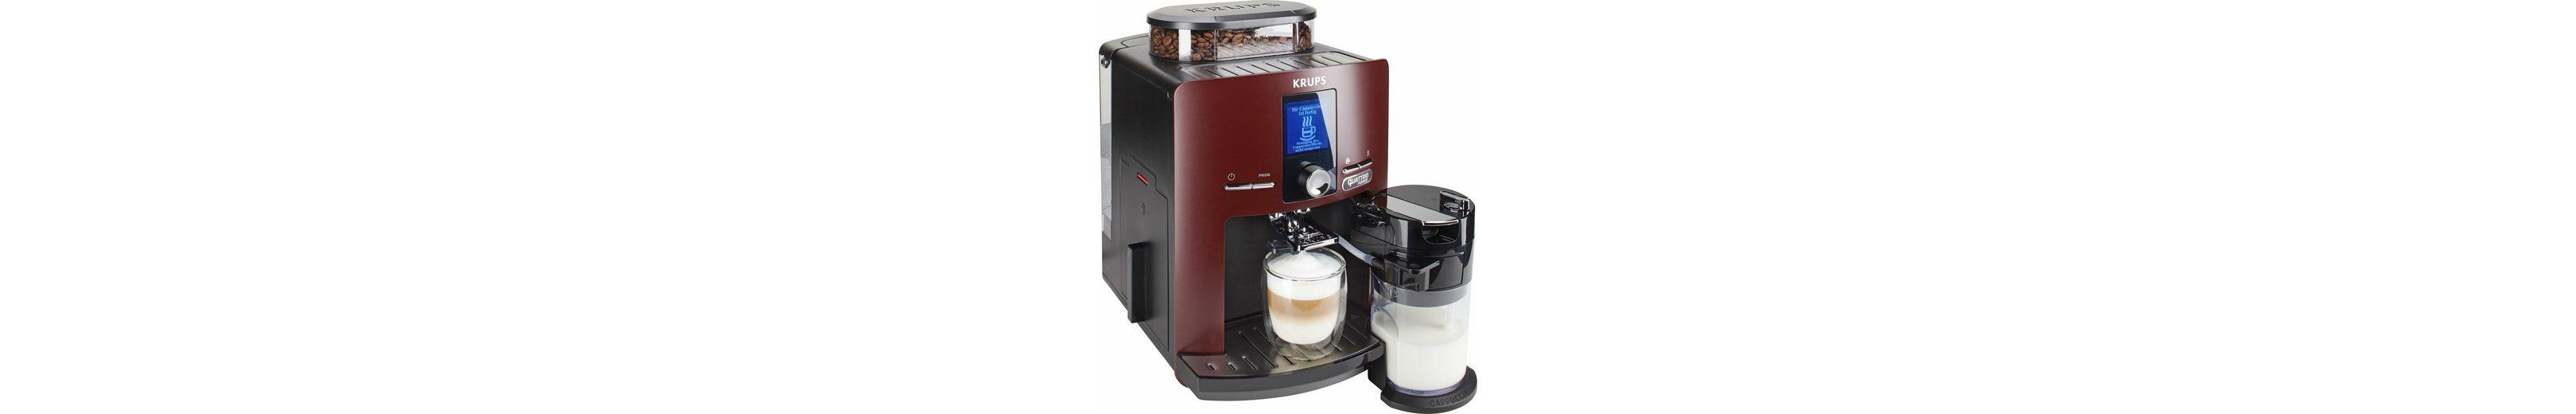 Krups Kaffeevollautomat EA829G Latt'Espress Quattro Force, One-Touch Funktion, Milchbehälter, 1,7 L